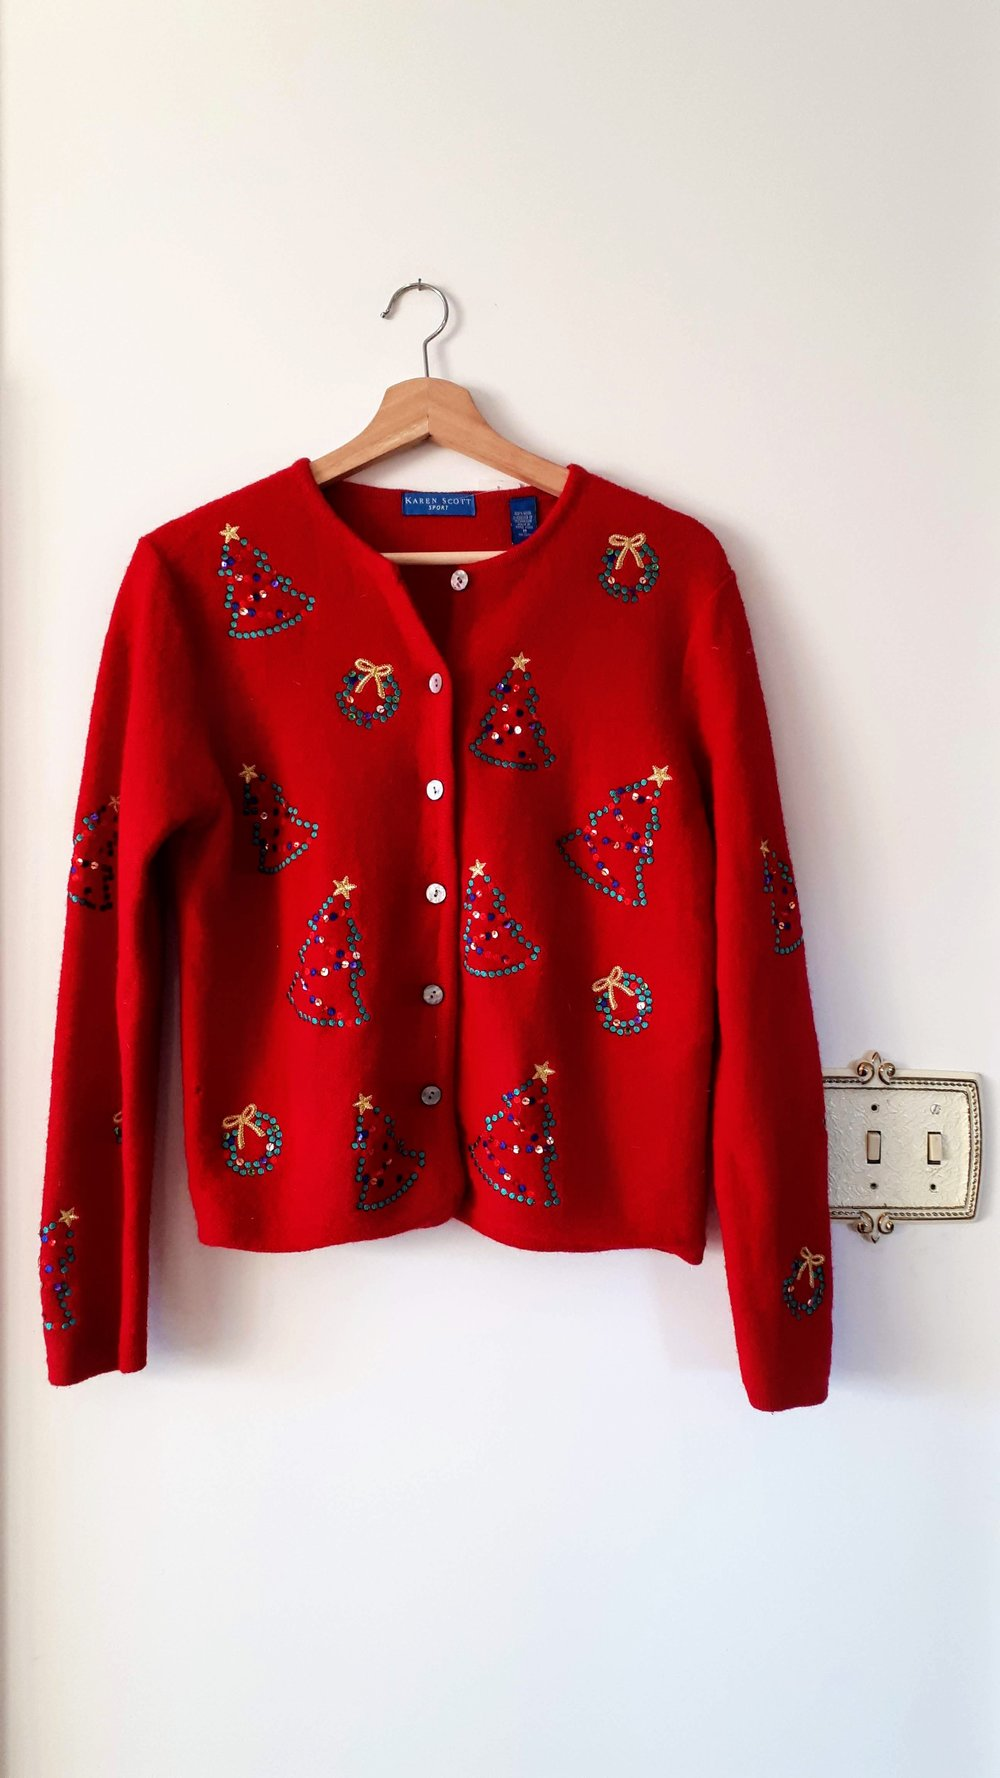 Sweater; Size M, $22